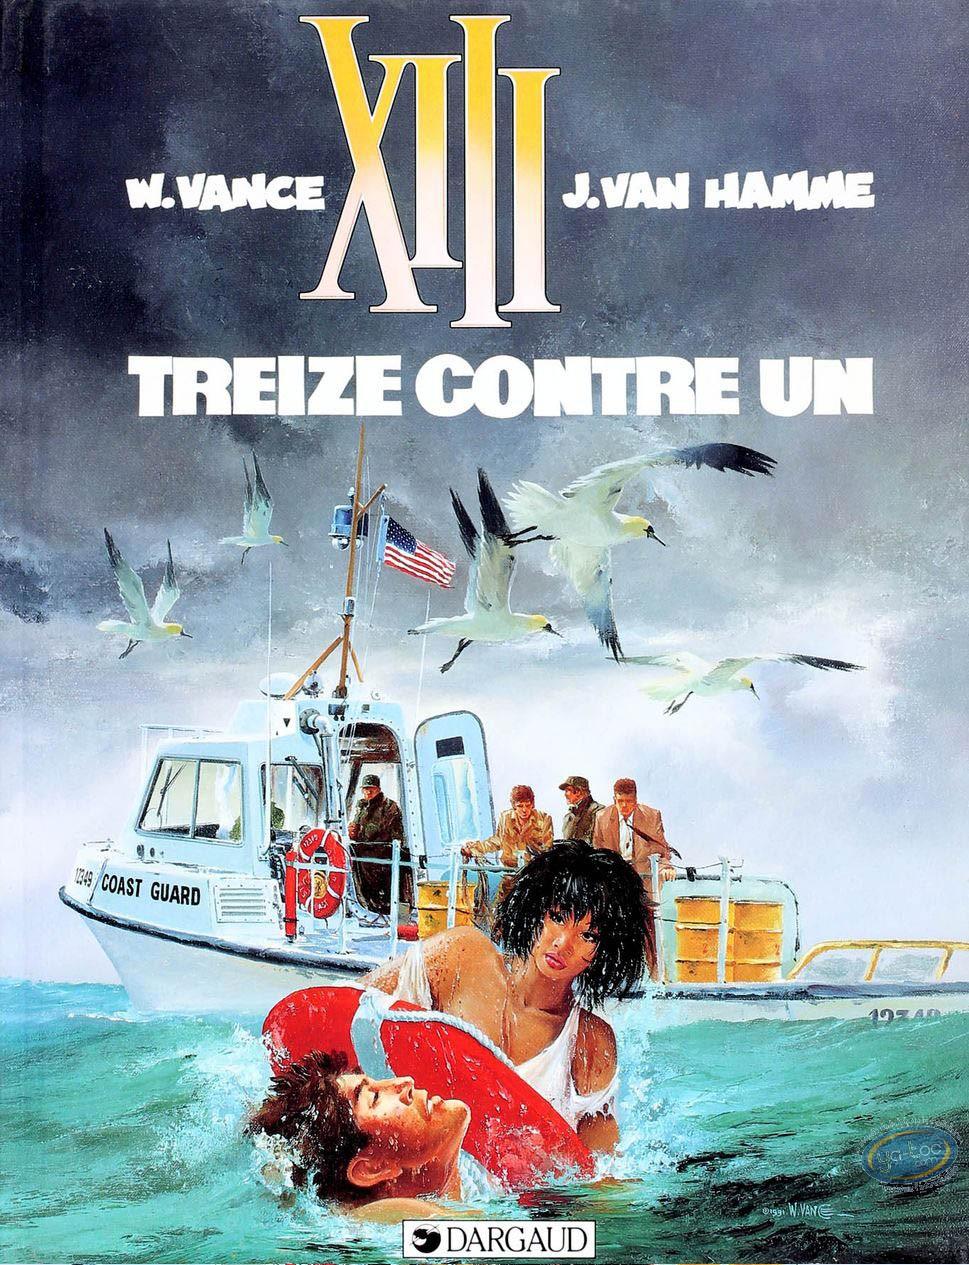 Listed European Comic Books, XIII : Treize Contre Un